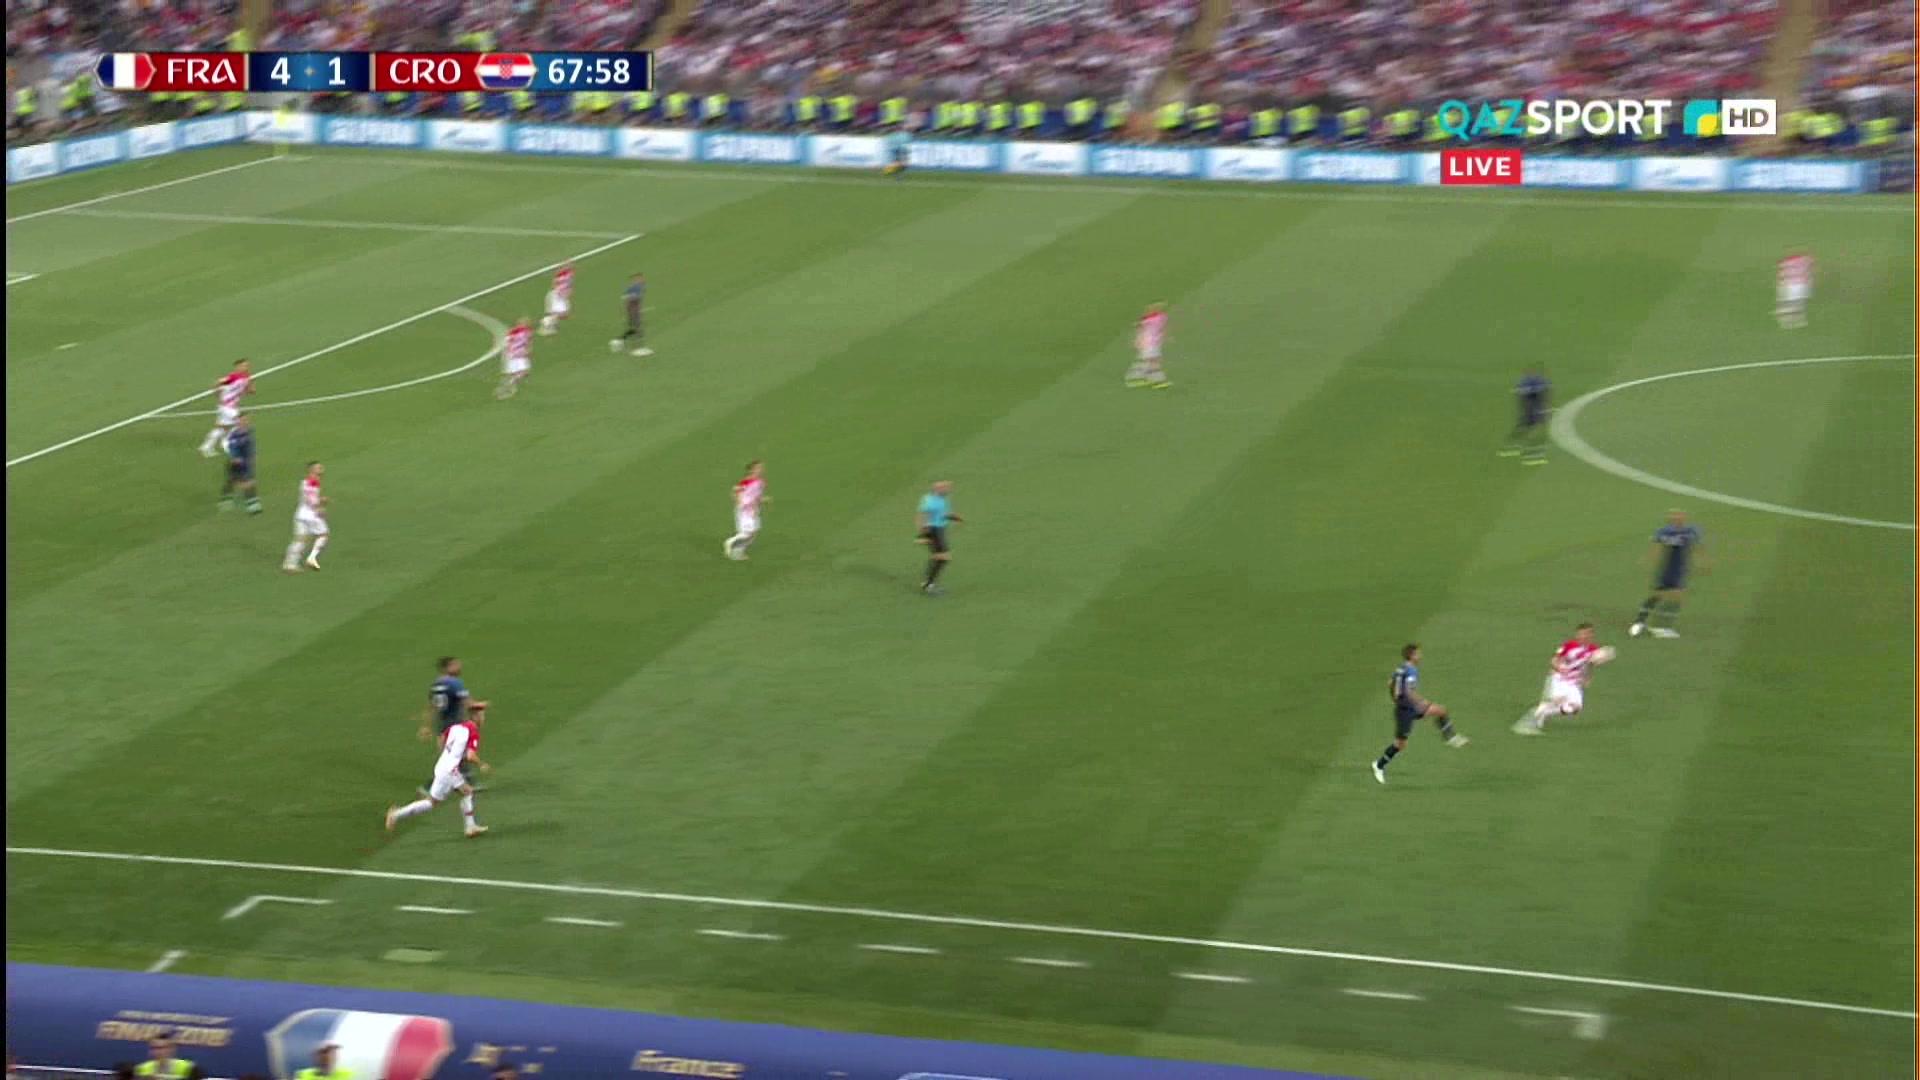 Франция 4:2 Хорватия | Гол Марио Манджукича